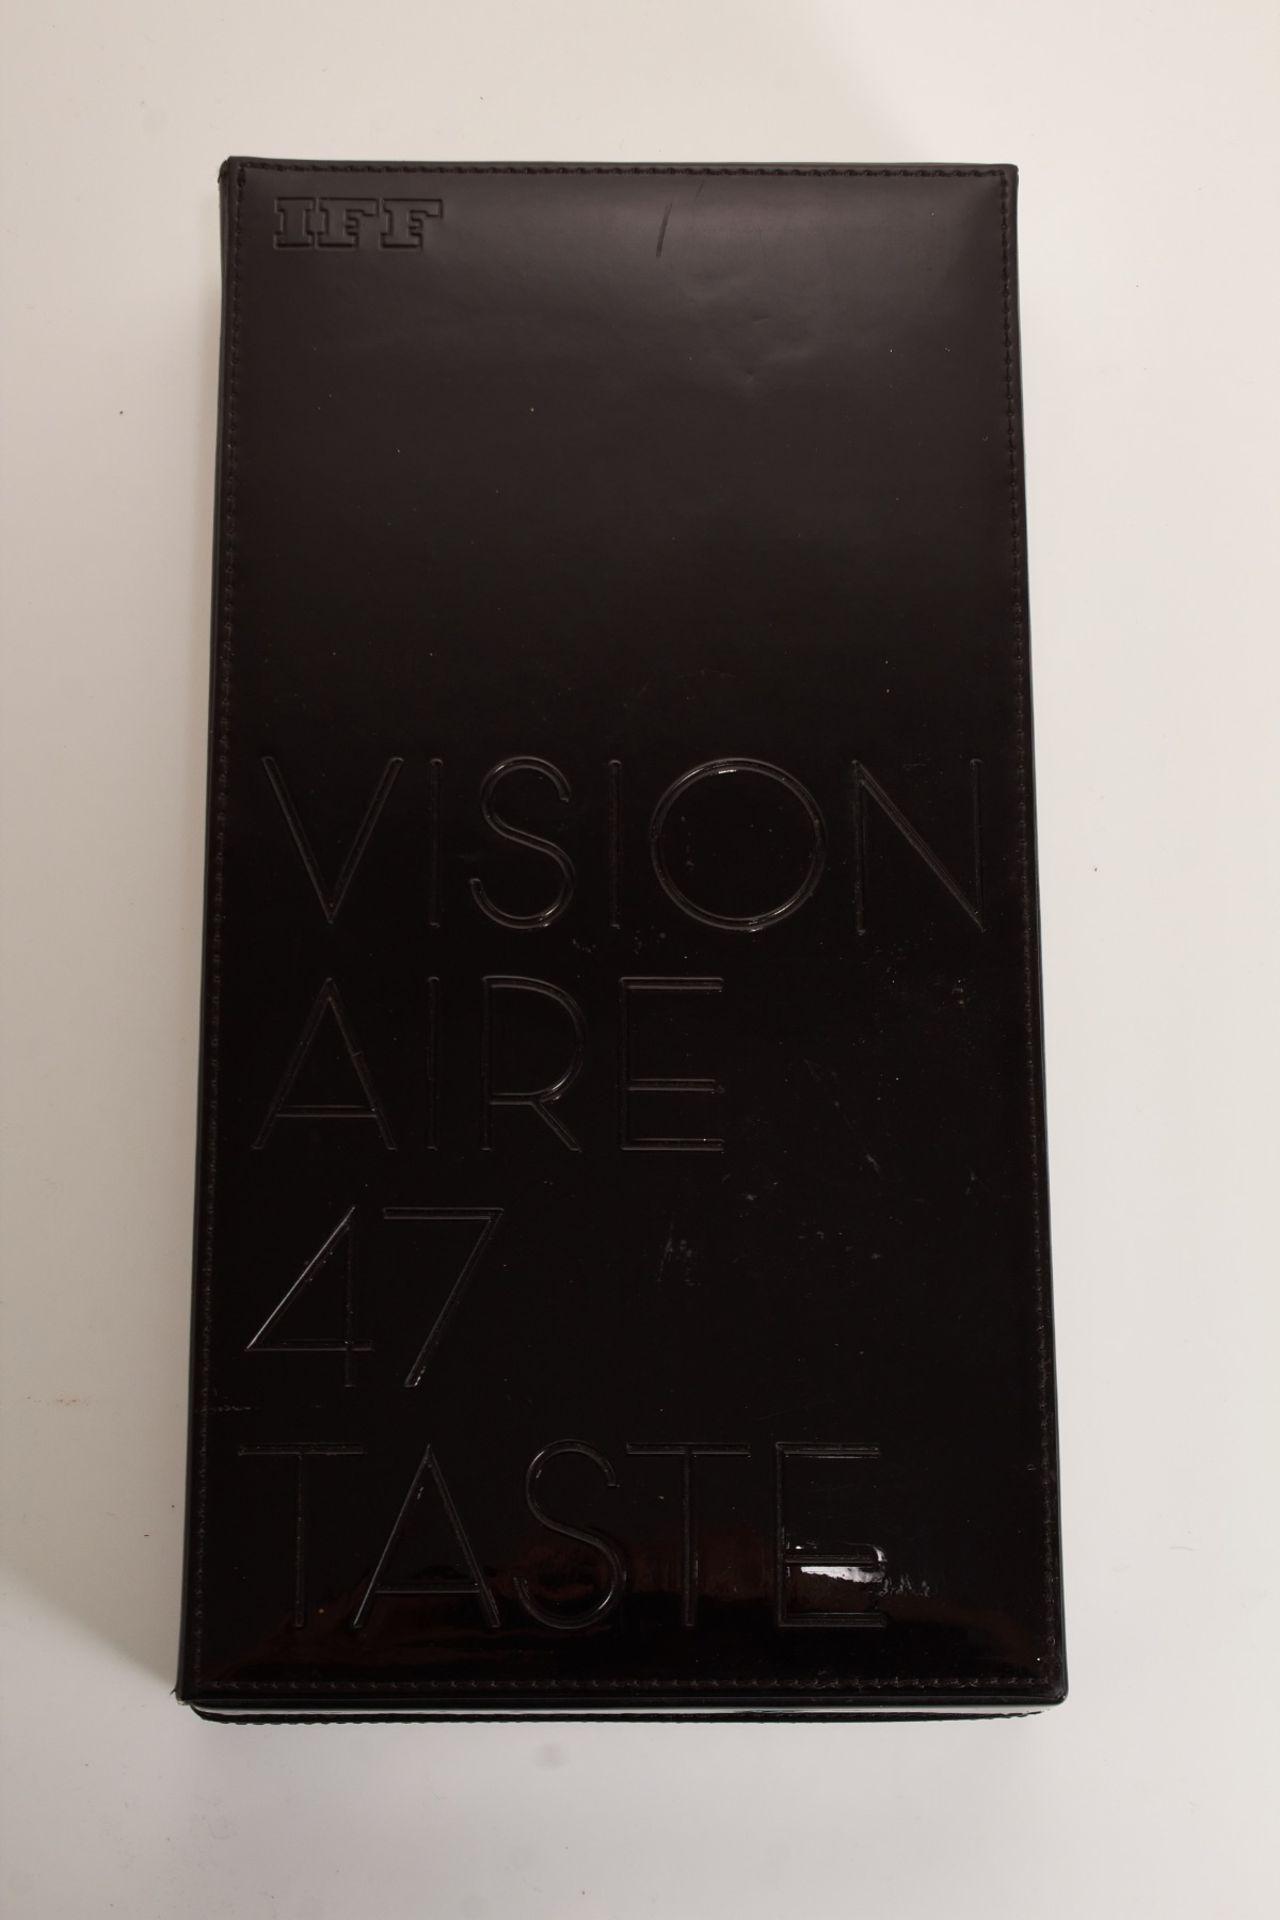 Los 71 - VISIONAIRE 47 TASTE